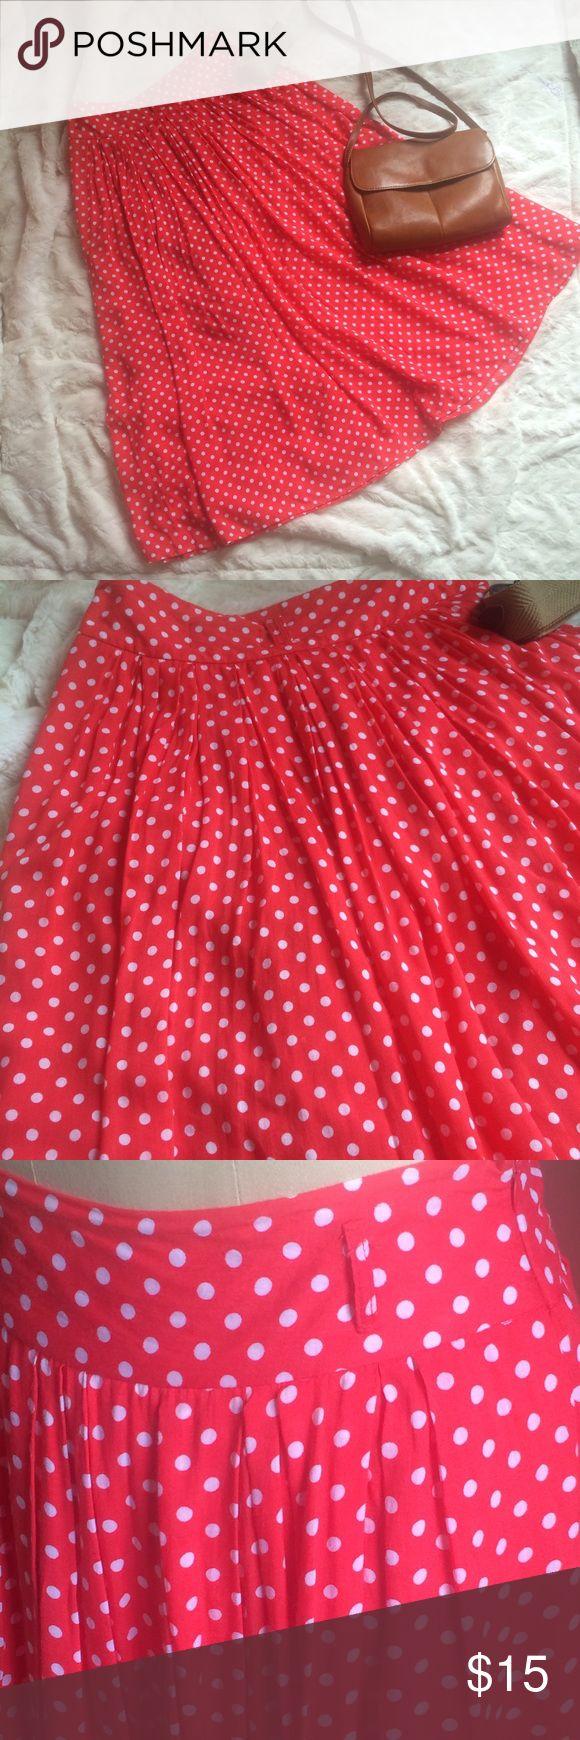 "ATown Polka dot Long Pleated Skirt ATown Polka dot Long Pleated lined Skirt 100% Rayon 31"" in length 28"" waist Skirts A-Line or Full"